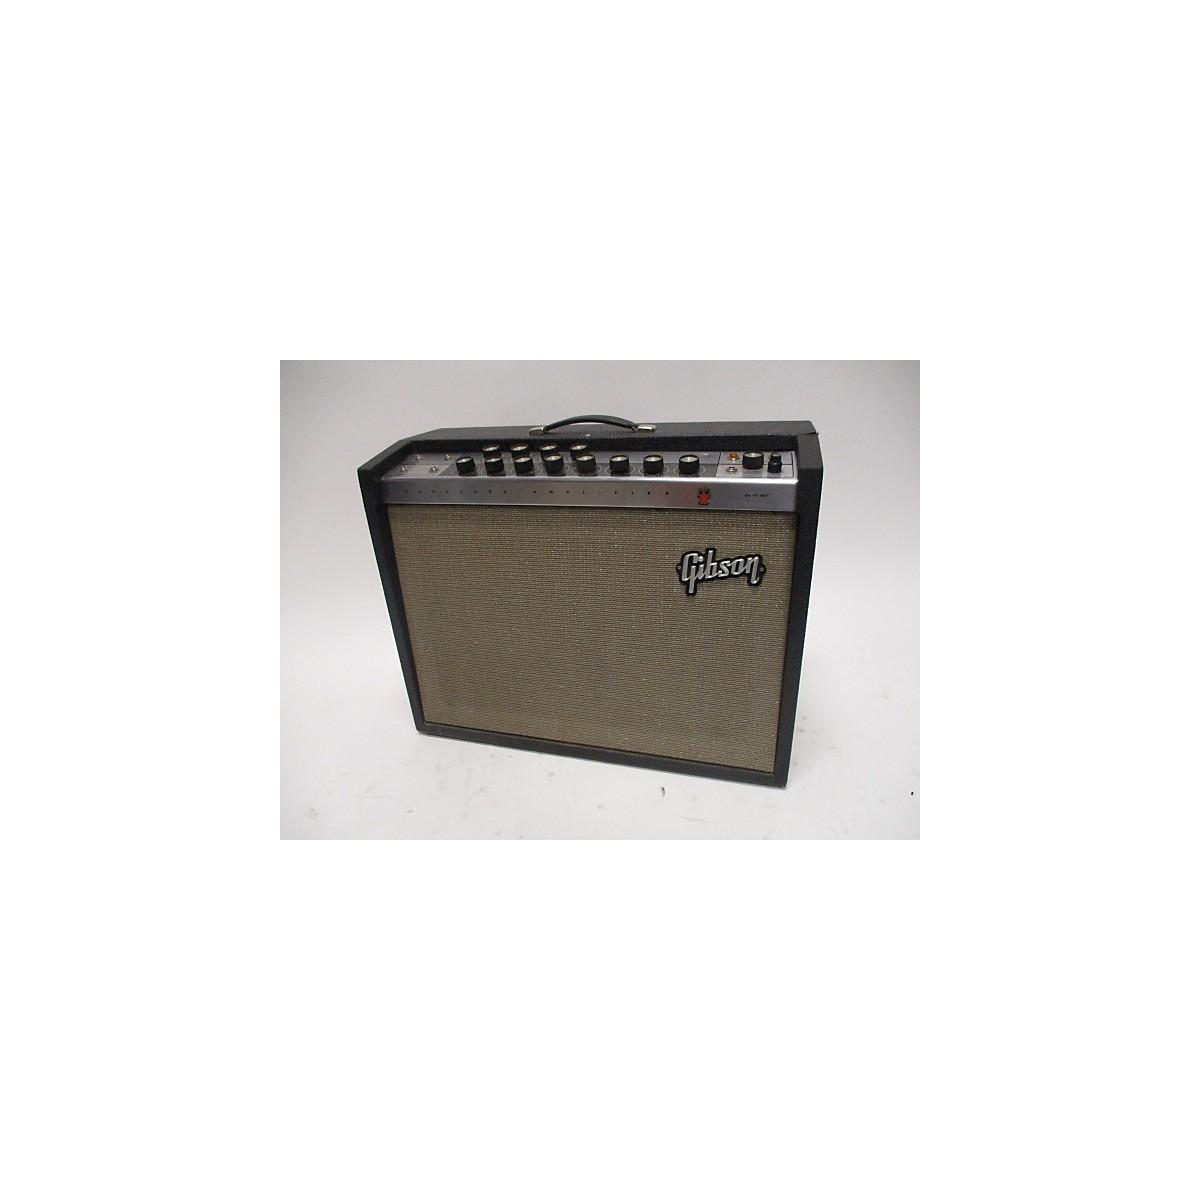 Gibson 1965 GA 77 RET Tube Guitar Combo Amp